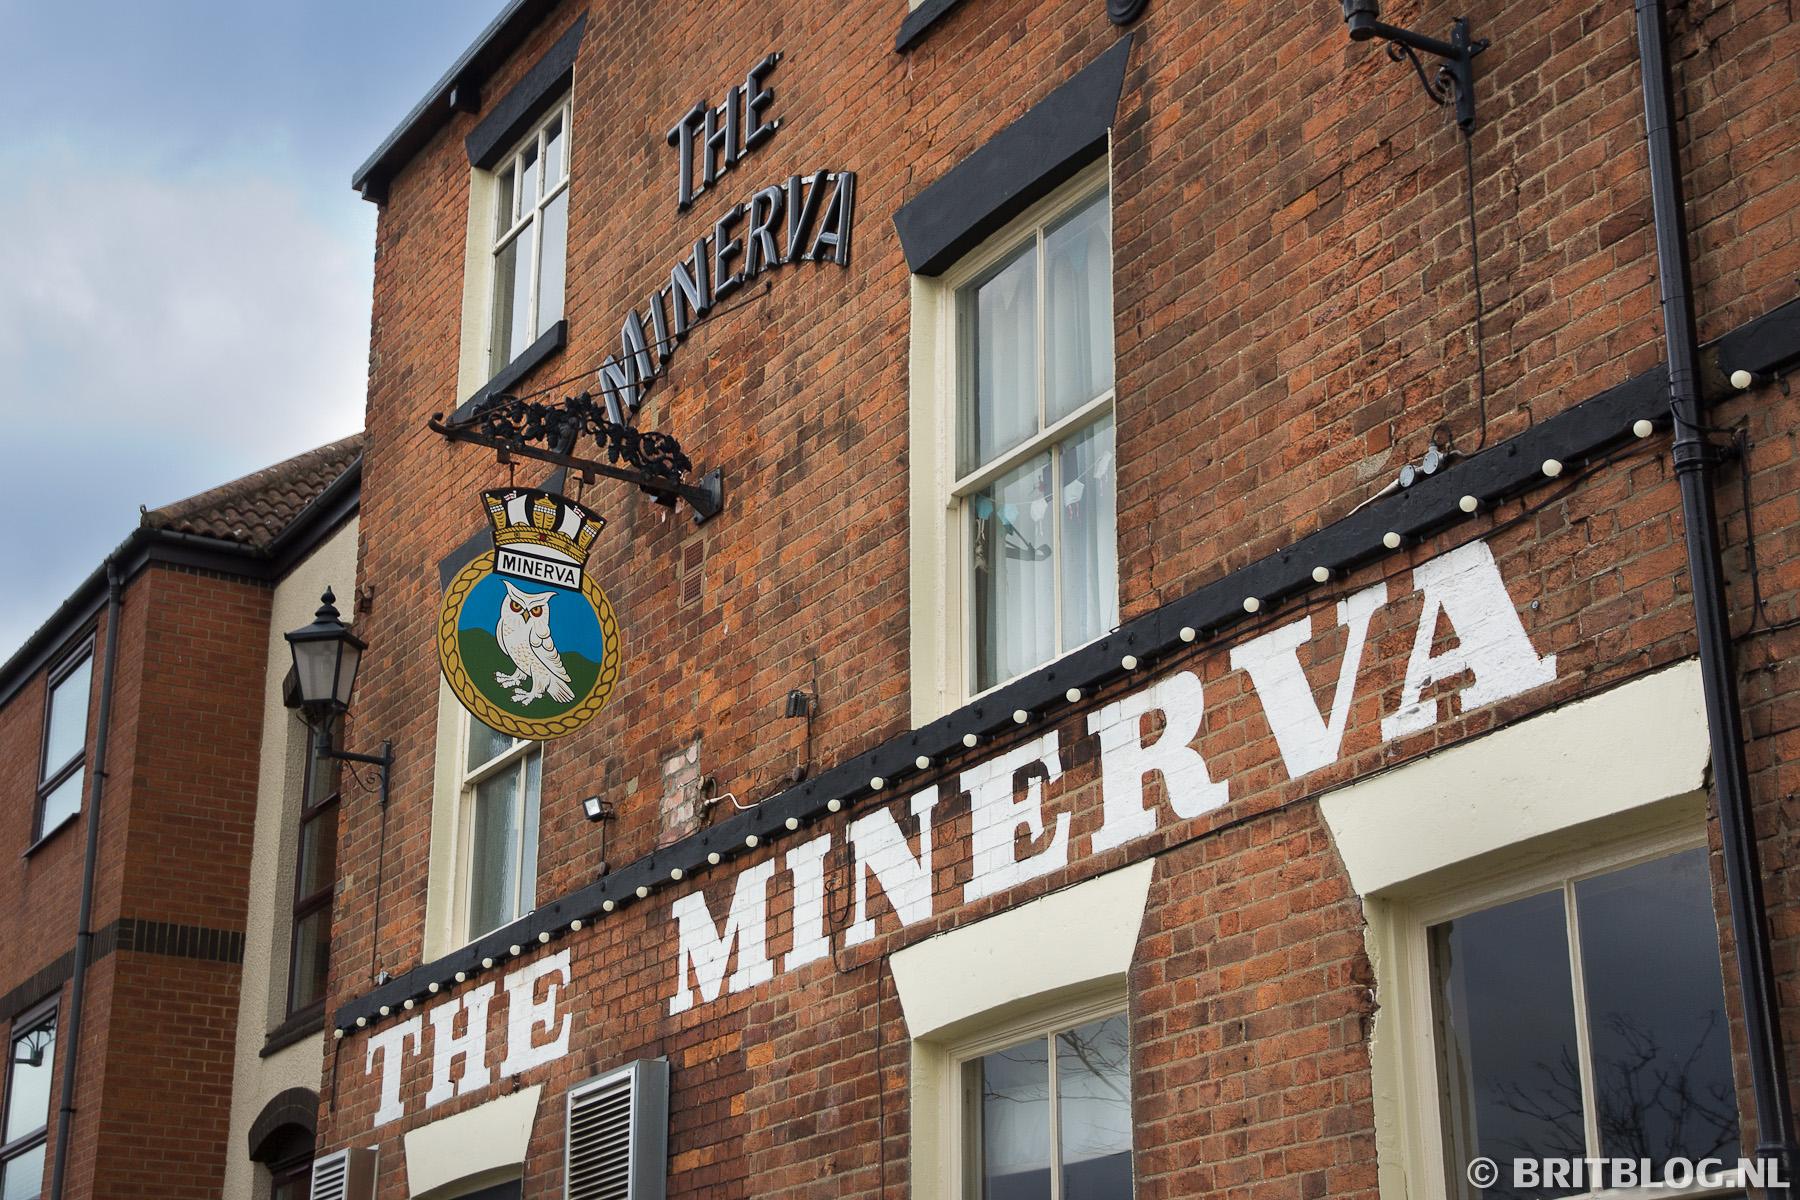 The Minerva